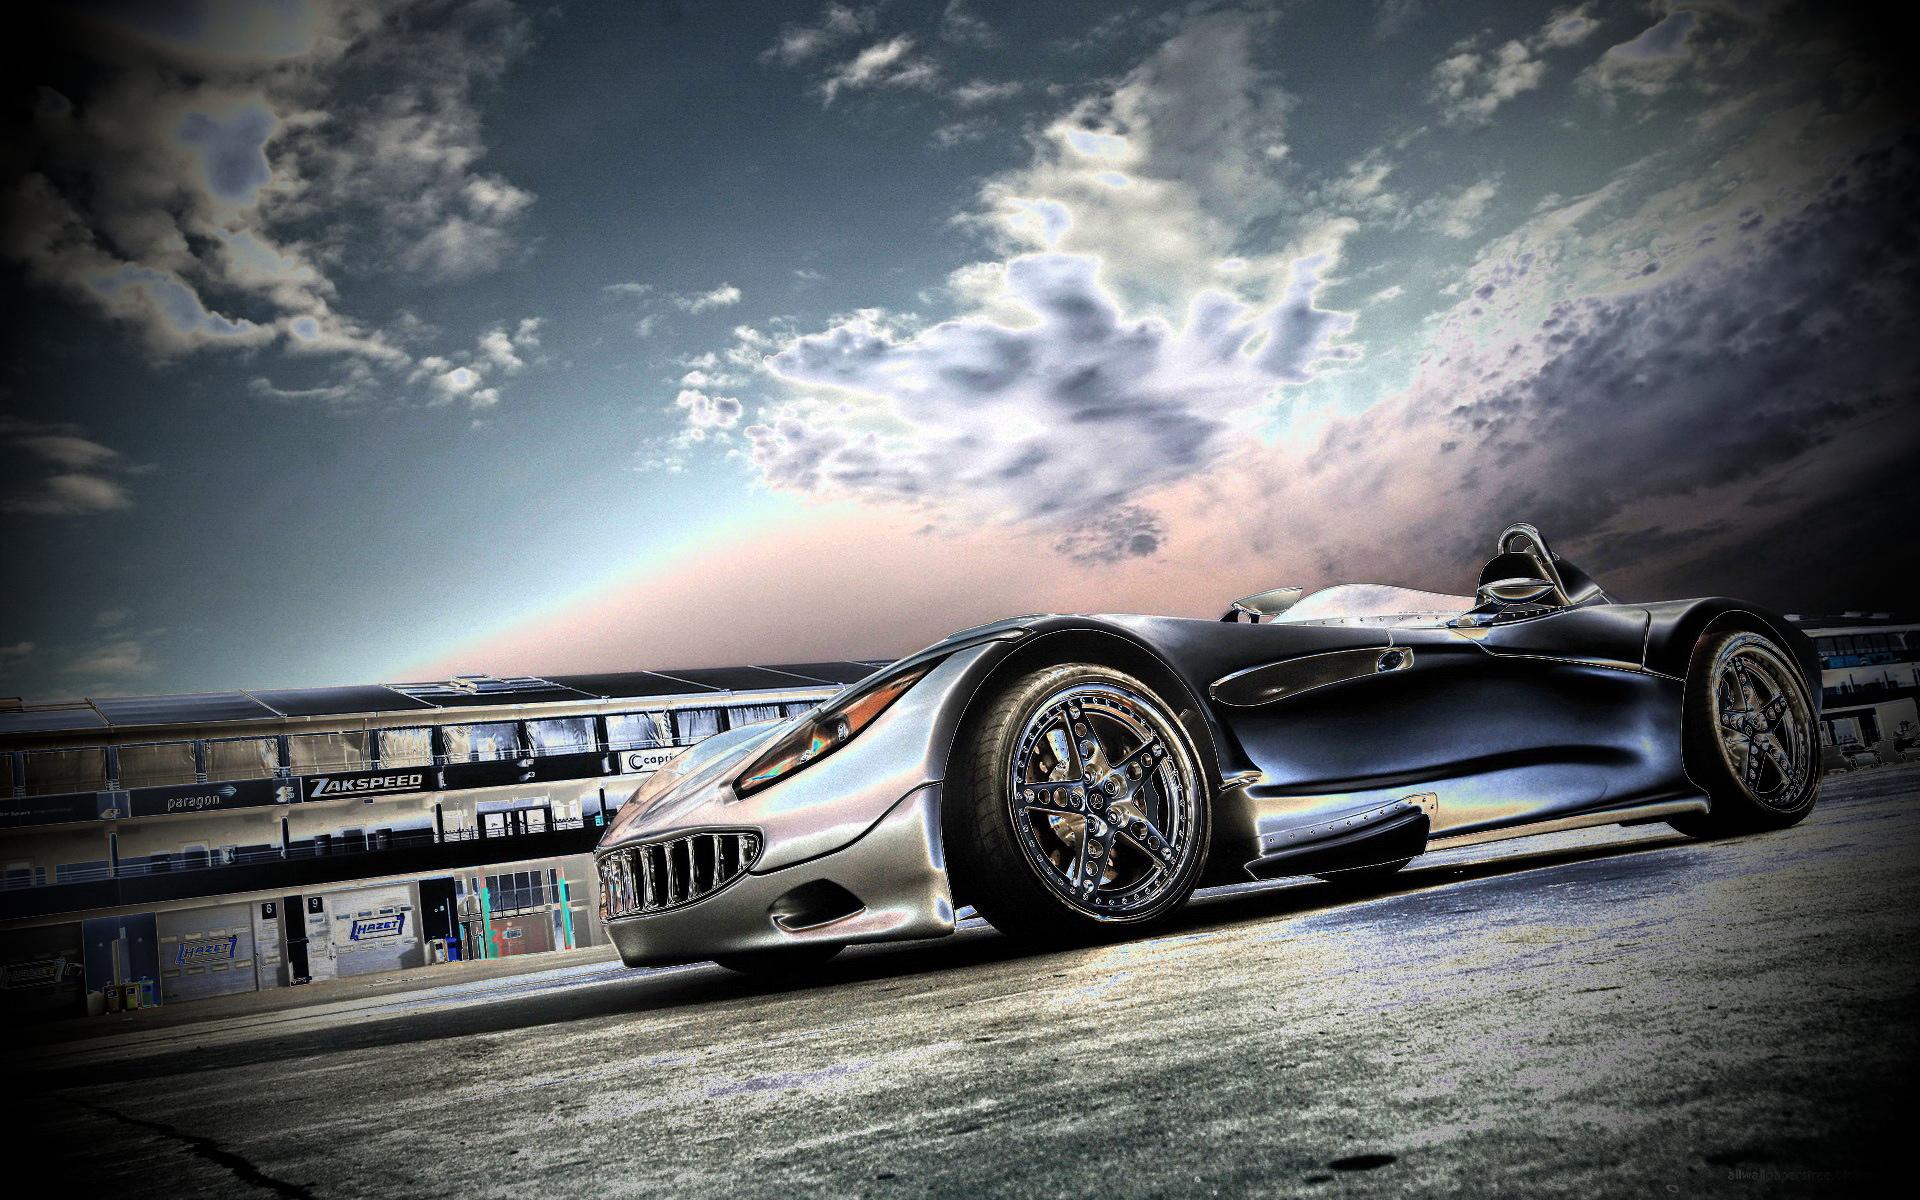 Thunderhill Race Car Wallpaper: Racing Car Pictures Wallpaper